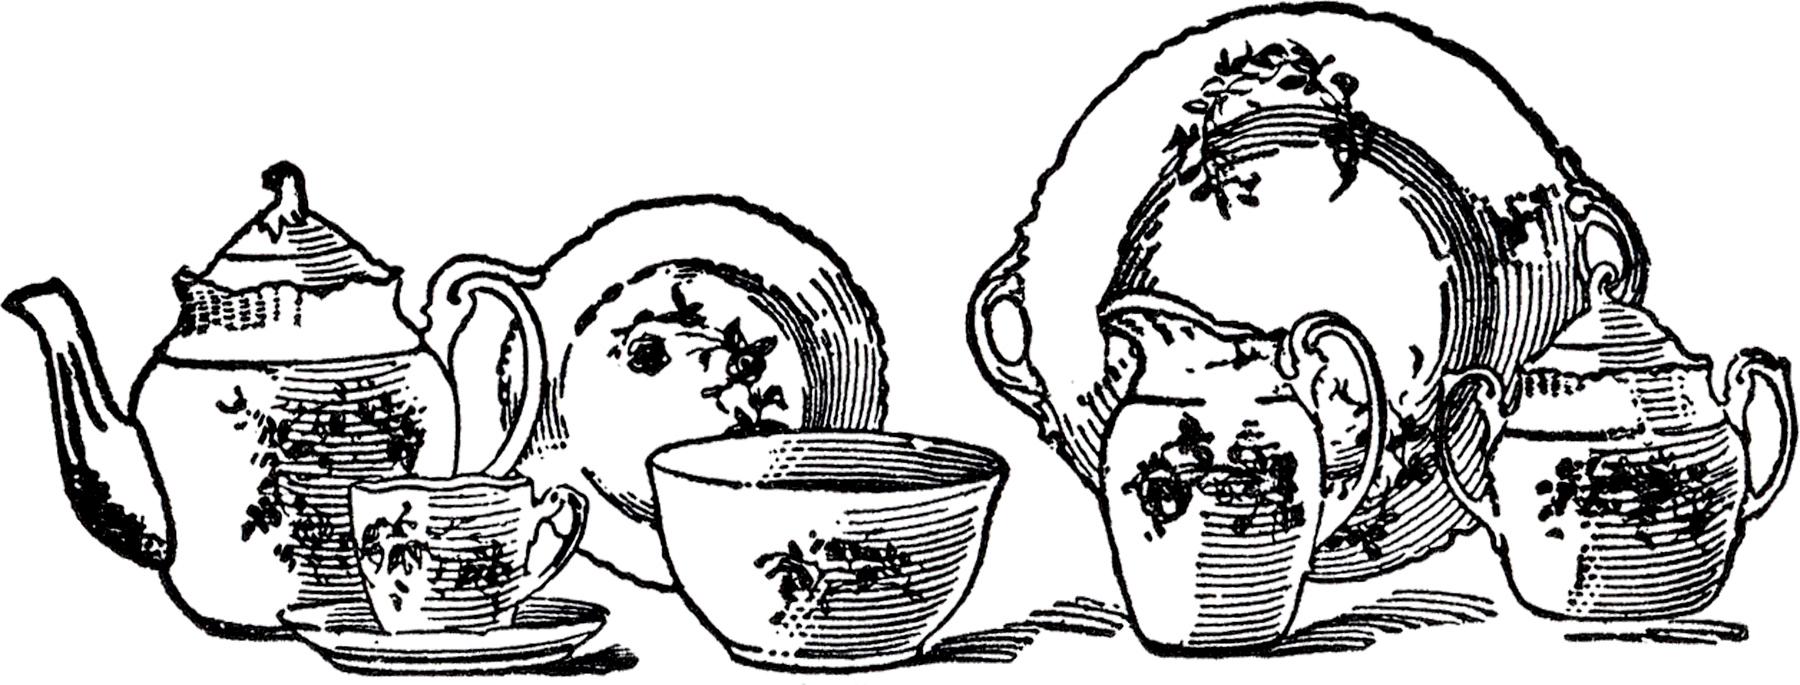 China clipart set. Vintage tea image the